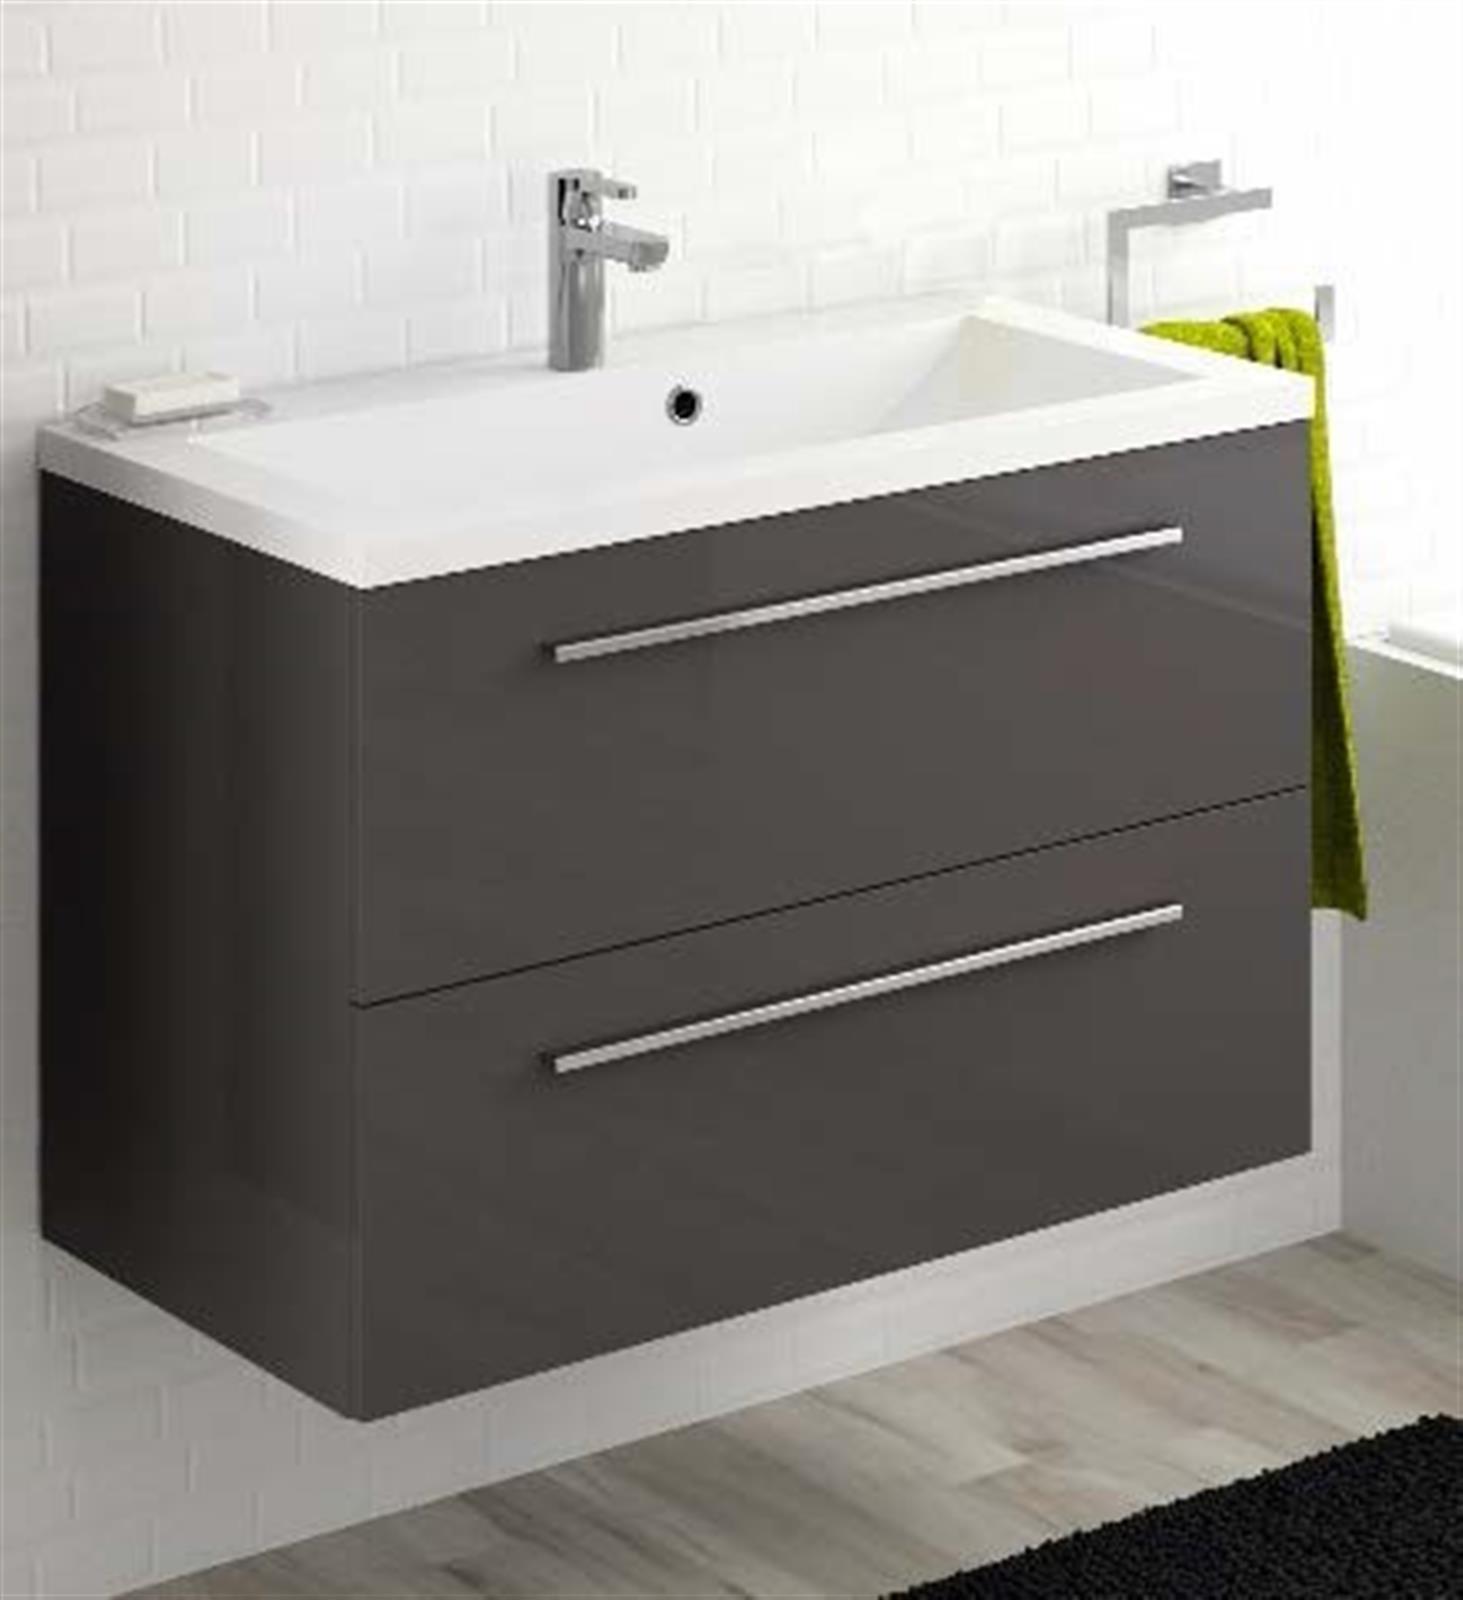 Meuble sous vasque 2 tiroirs 80 cm s rie adesio 3 - Vide sanitaire meuble cuisine ...